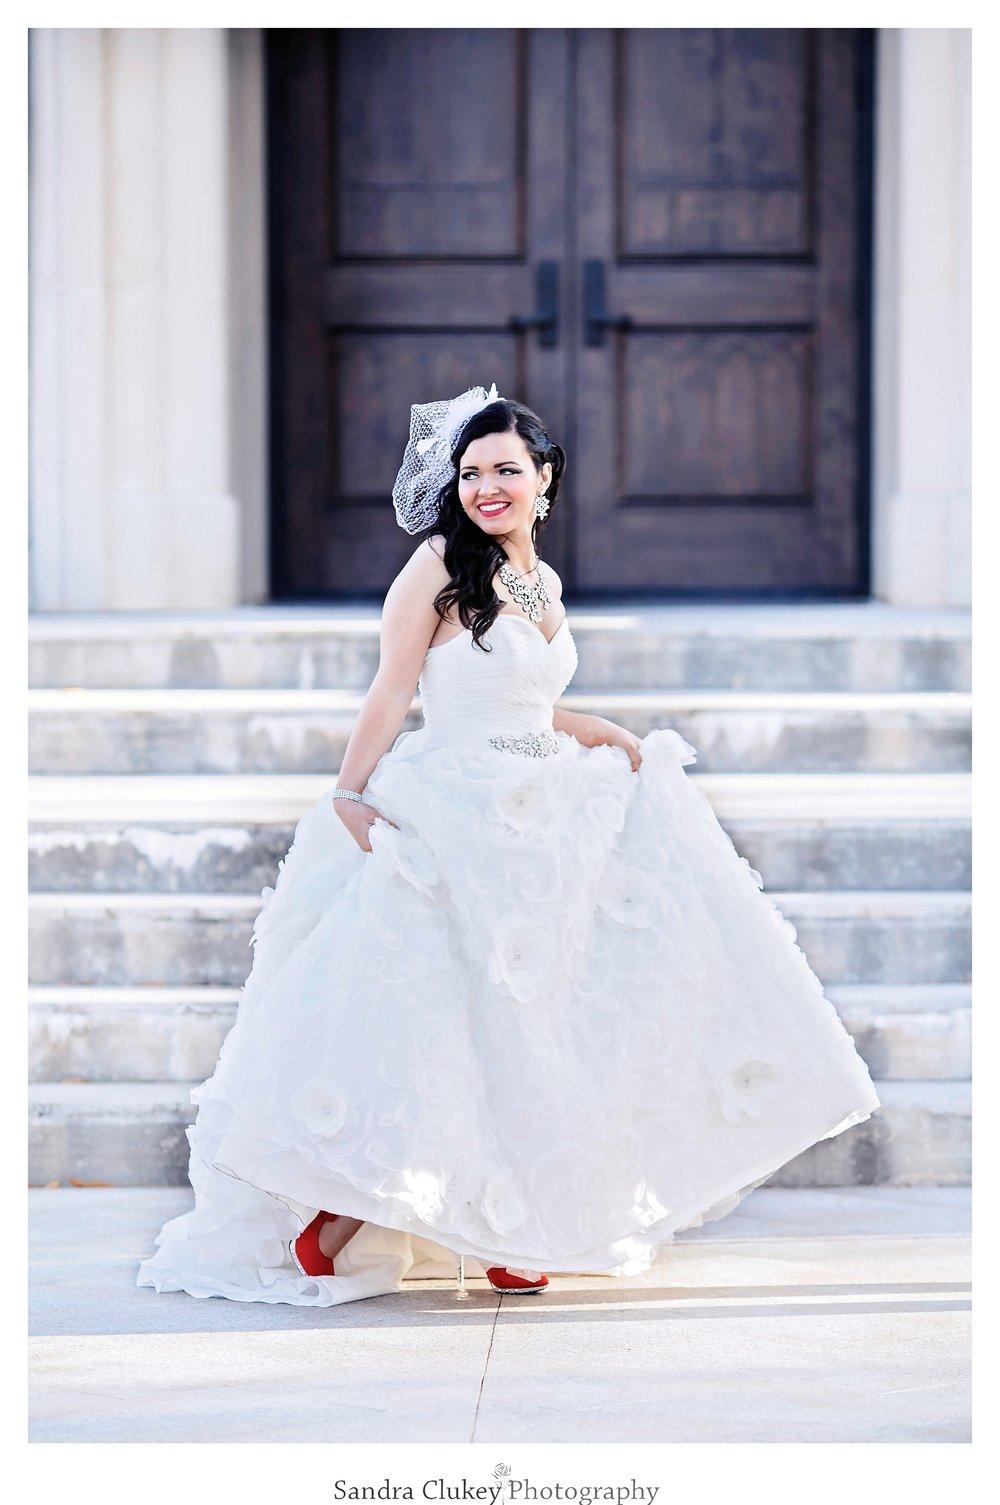 Adorable Bride at Lee University Chapel, Cleveland TN